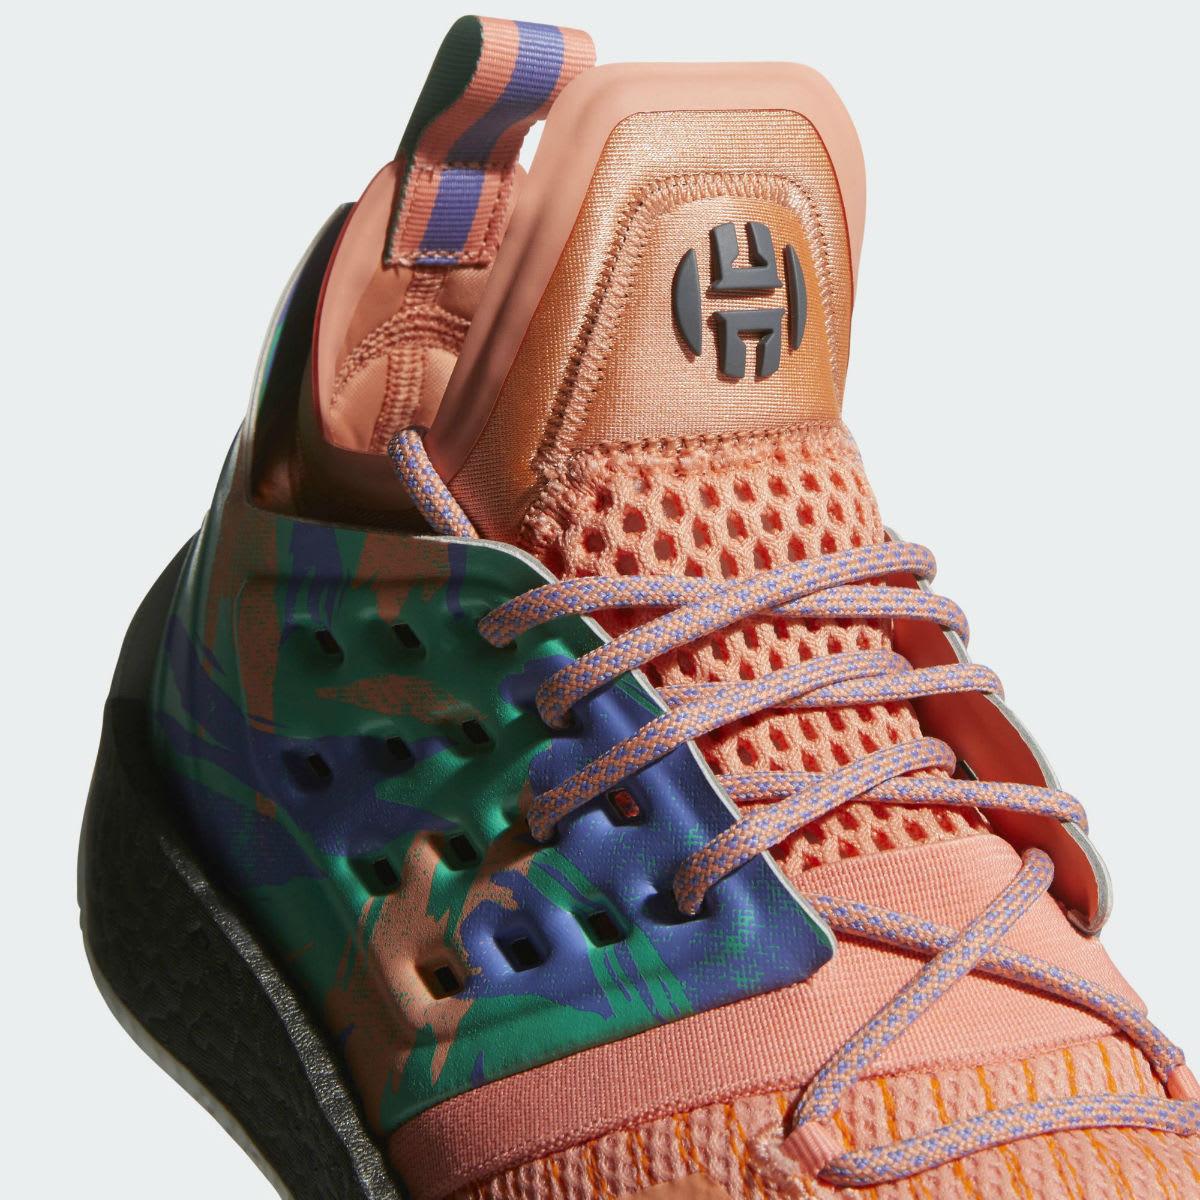 Adidas Harden Vol. 2 Orange Release Date AH2219 Tongue